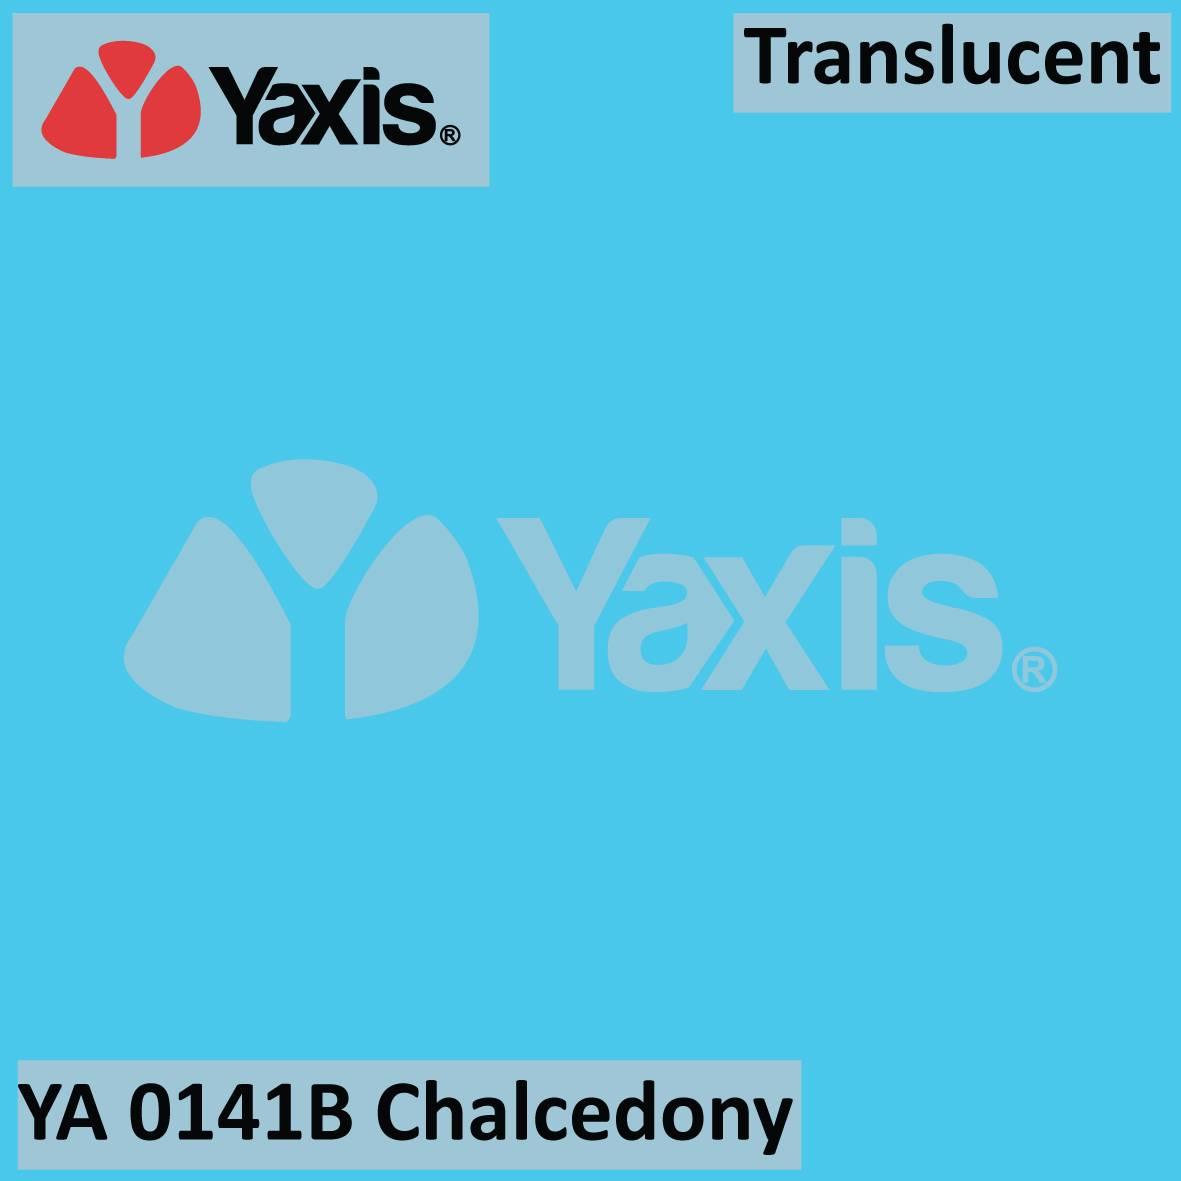 YA 0141B-chalcedony-light blue-translucent-solid surface-quartz-stone